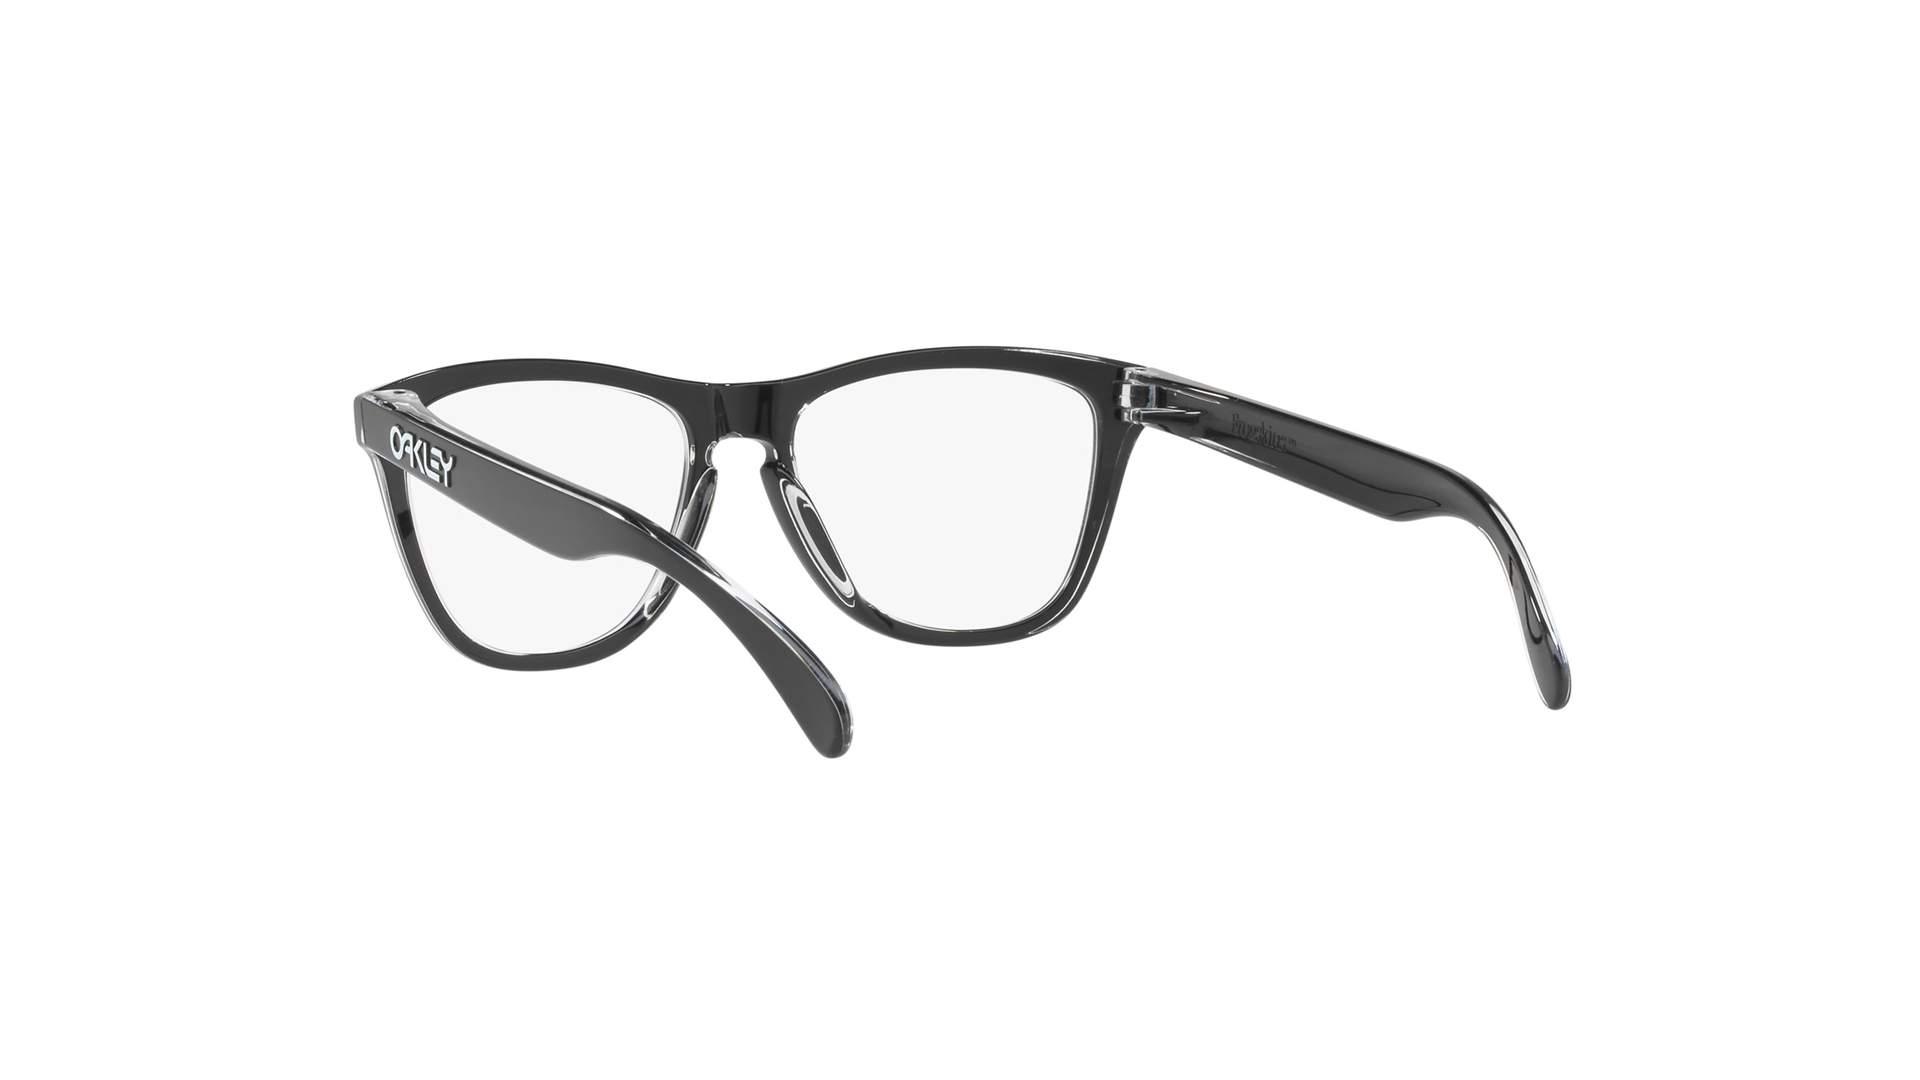 888820bcfd Eyeglasses Oakley Frogskins Black Matte OX8131 04 54-17 Medium